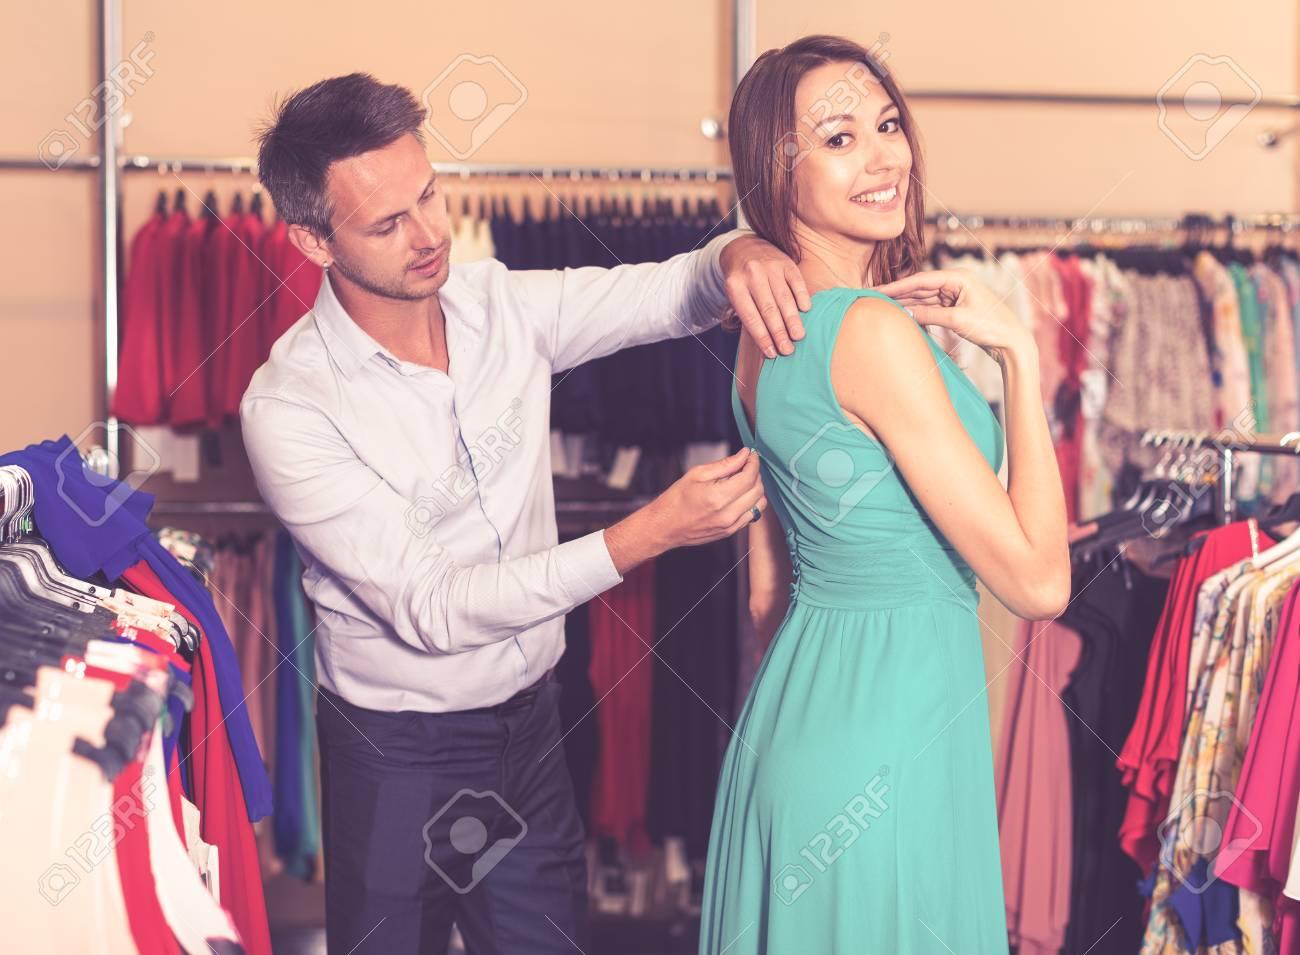 e672438e4f Portrait of family couple choosing new dress in women clothes shop Stock  Photo - 78814709